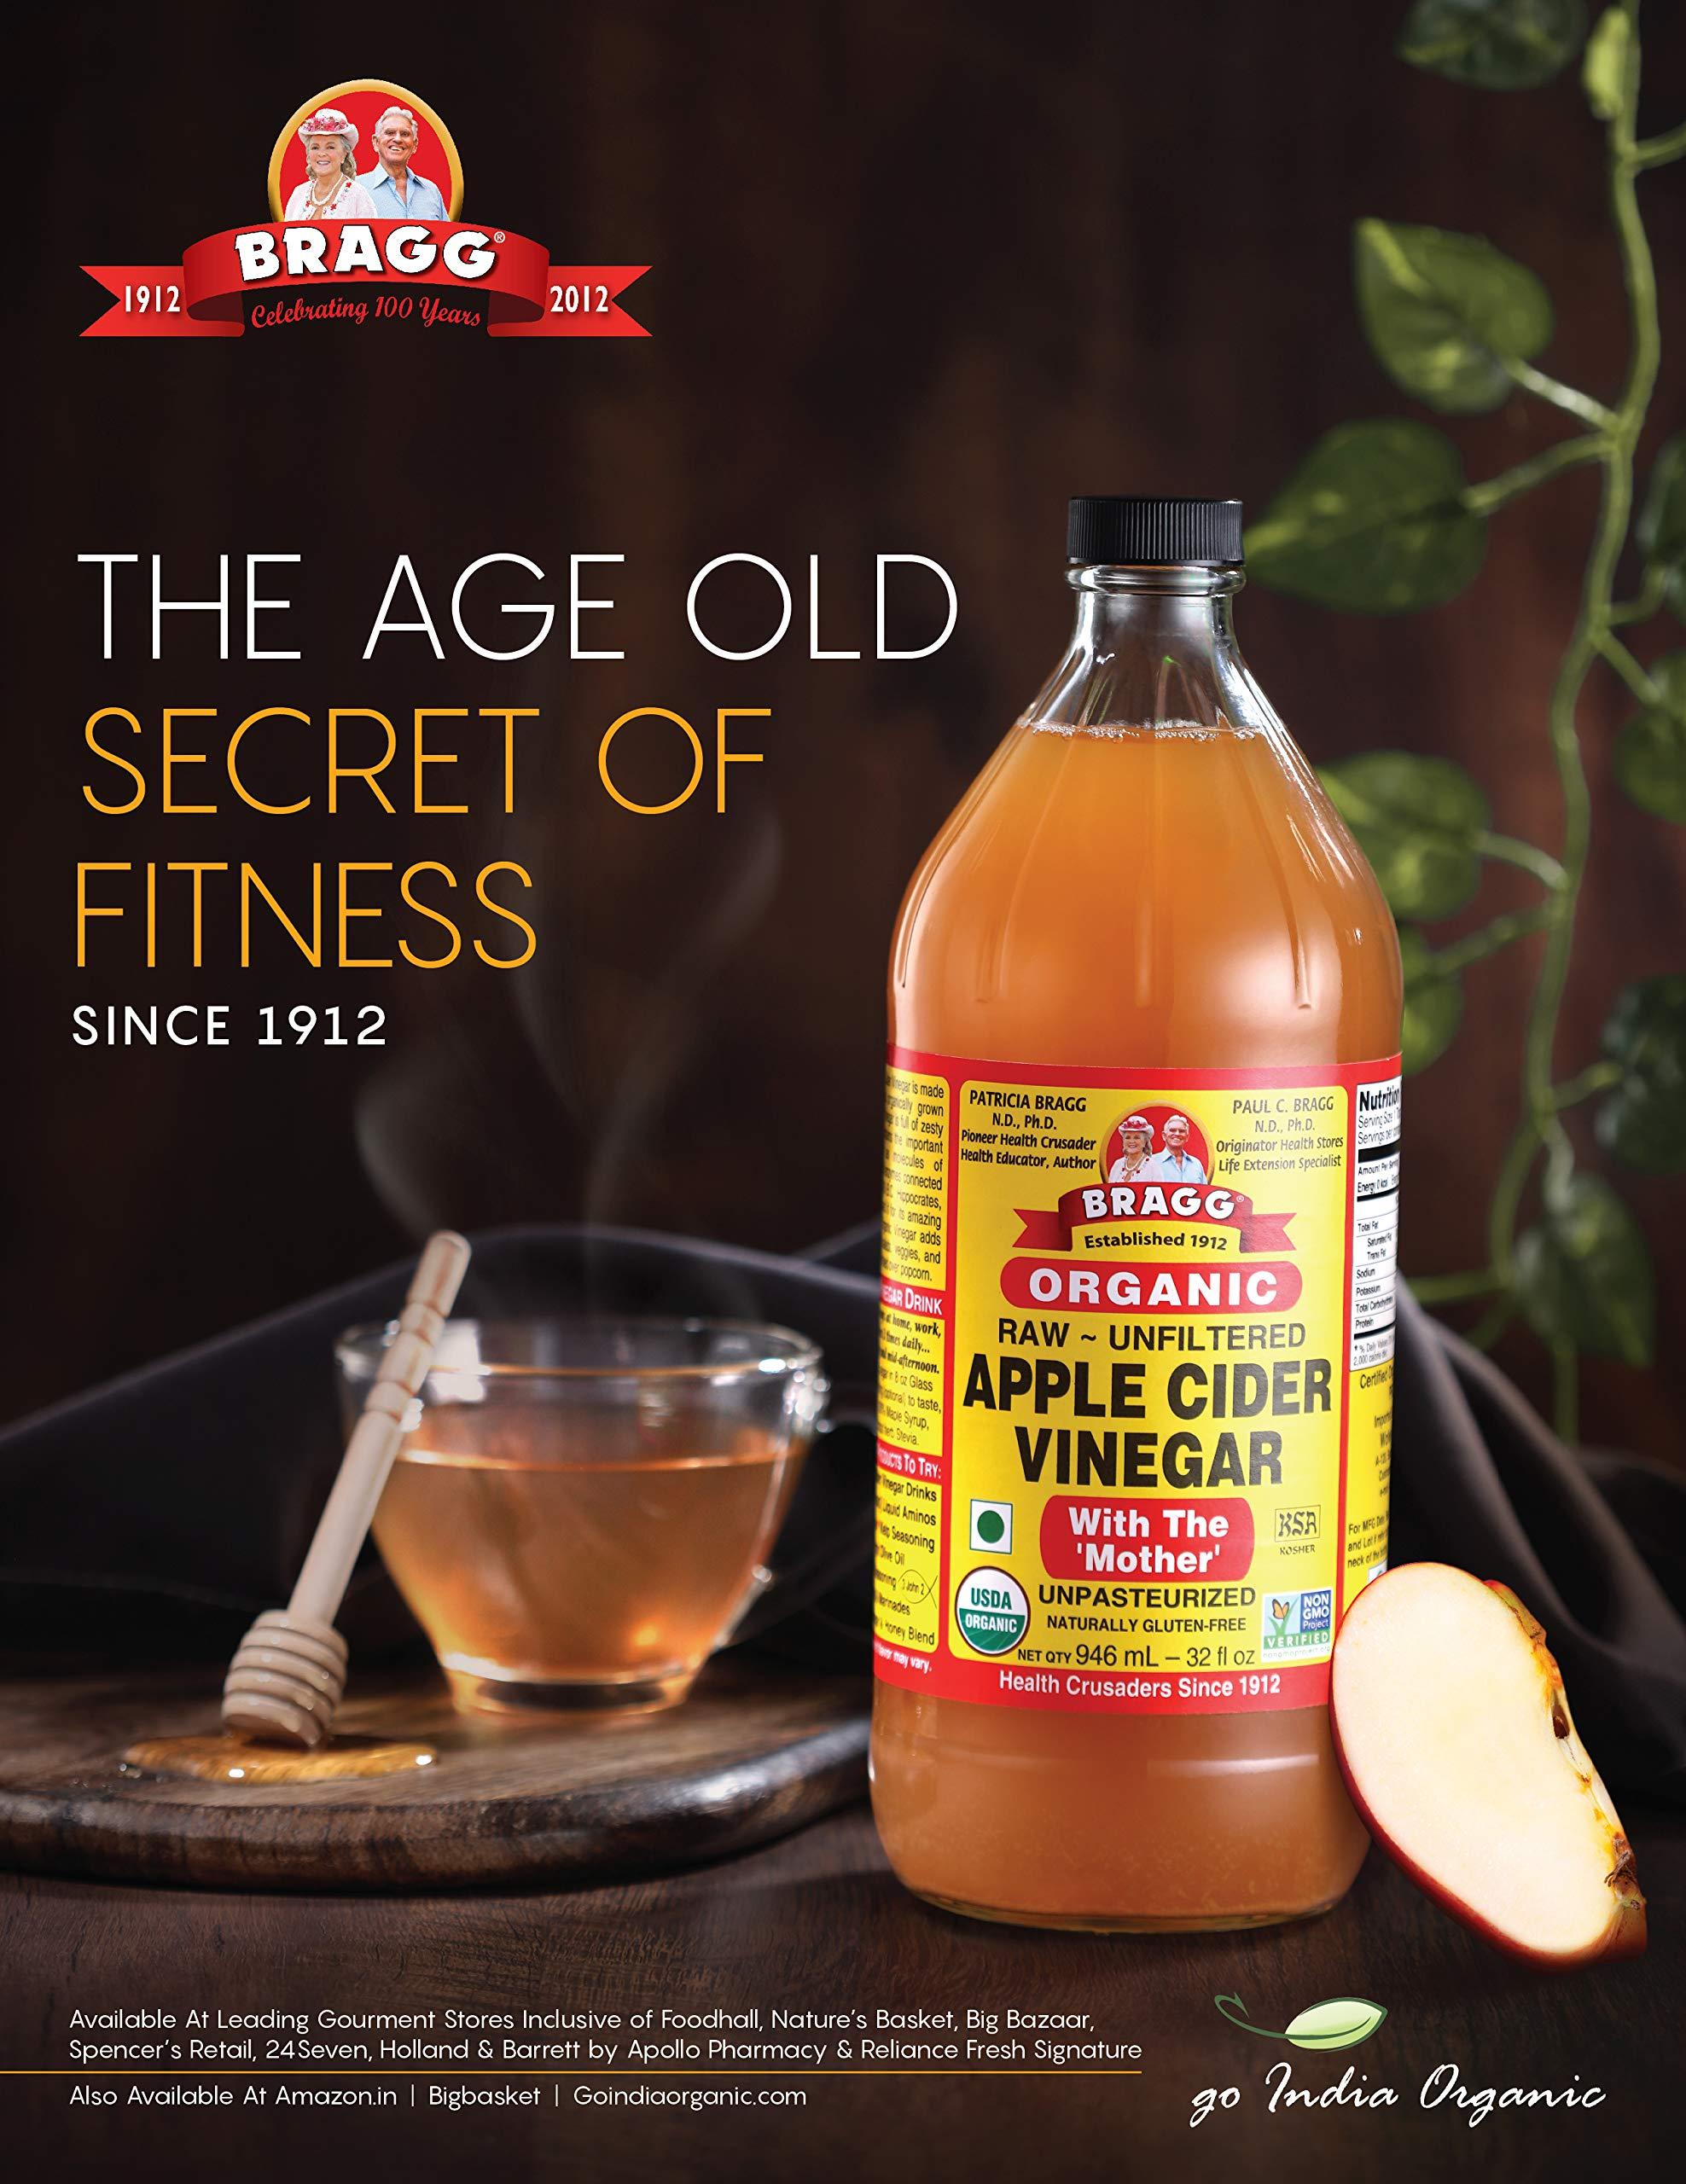 Organic Apple Cider Vinegar - nakedfoods.com.au